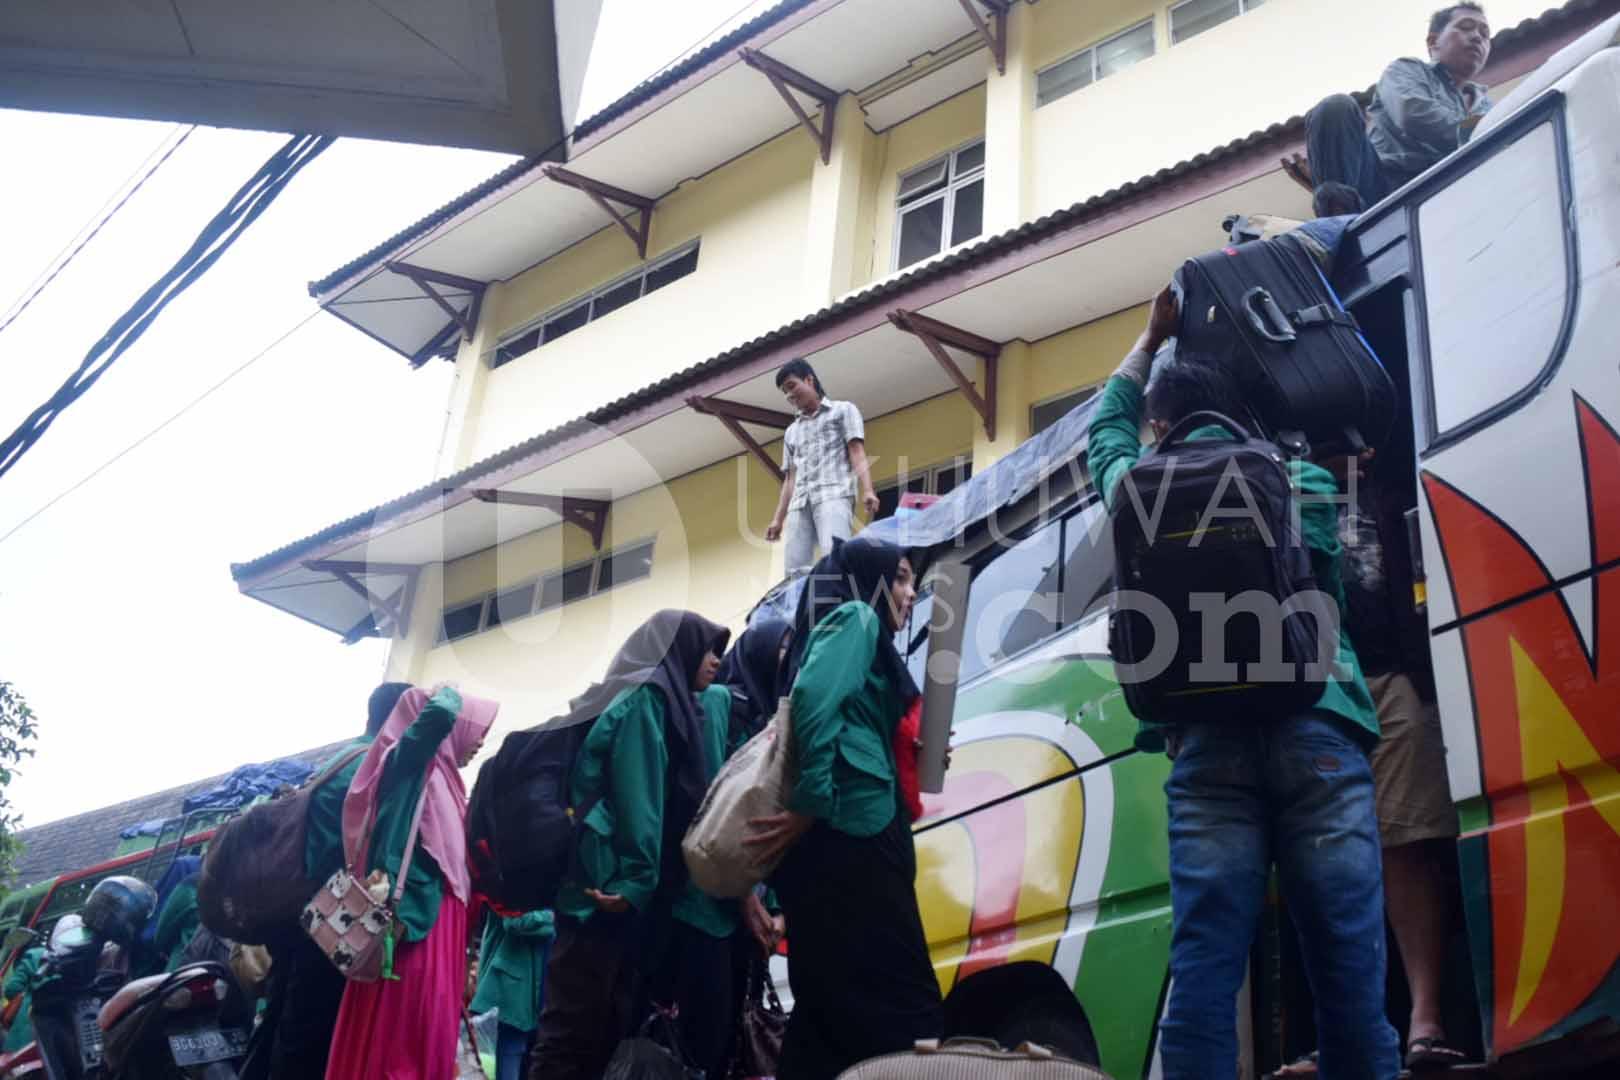 Berangkat- Sejumlah mahasiswa mahasiswa Universitas Islam Negeri Raden Fatah (UIN RF) Palembang mengikuti Kuliah Kerja Nyata (KKN) angkatan 67 sedang memasukkan barang-barangnya ke buskota yang akan berangkat ke daerah Kabupaten Banyuasin, pada Selasa (07/02/17).